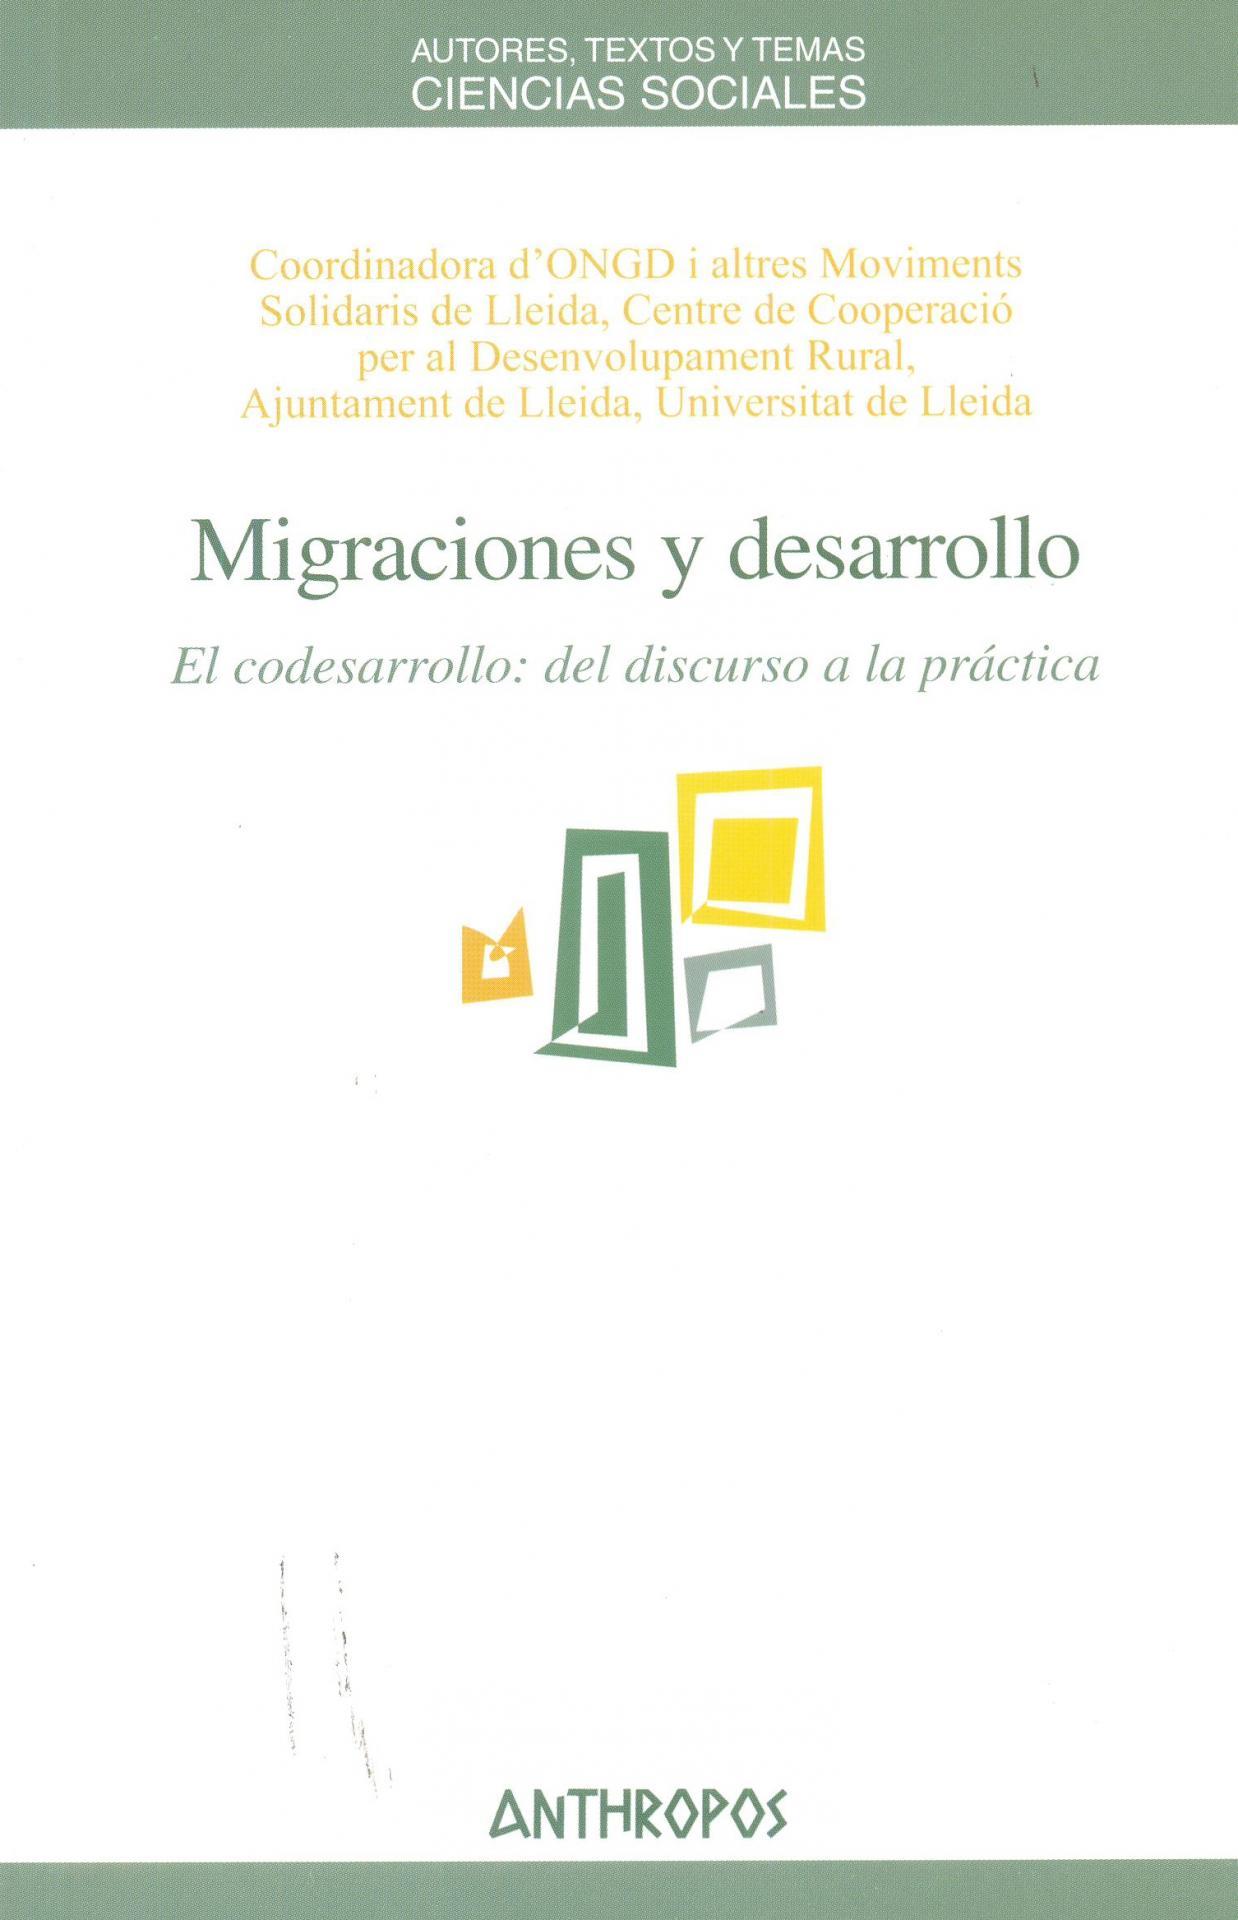 MIGRACIONES Y DESARROLLO. El codesarrollo: del discurso a la práctica.  Coordinadora d'ONGD i altres Moviments Solidaris de Lleida et al.